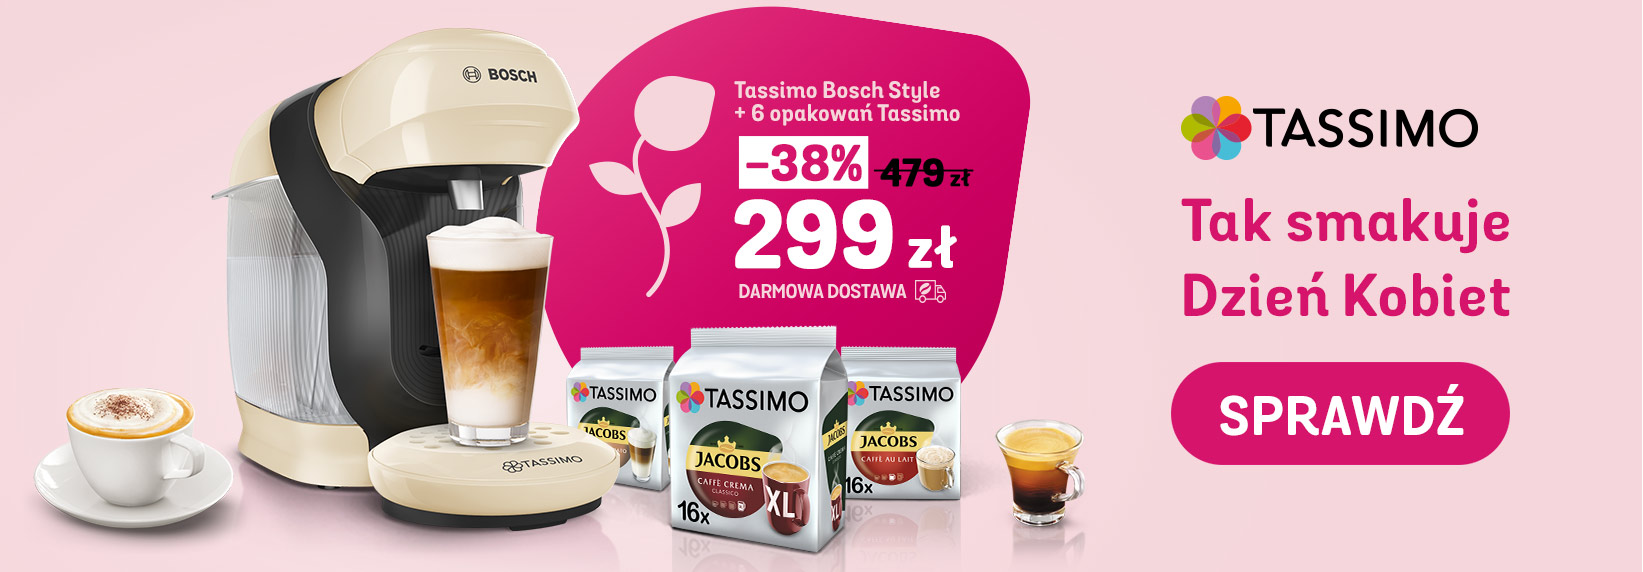 Eskpres Tassimo Bosch Style + 6 opakowań kaw i napojów Tassimo